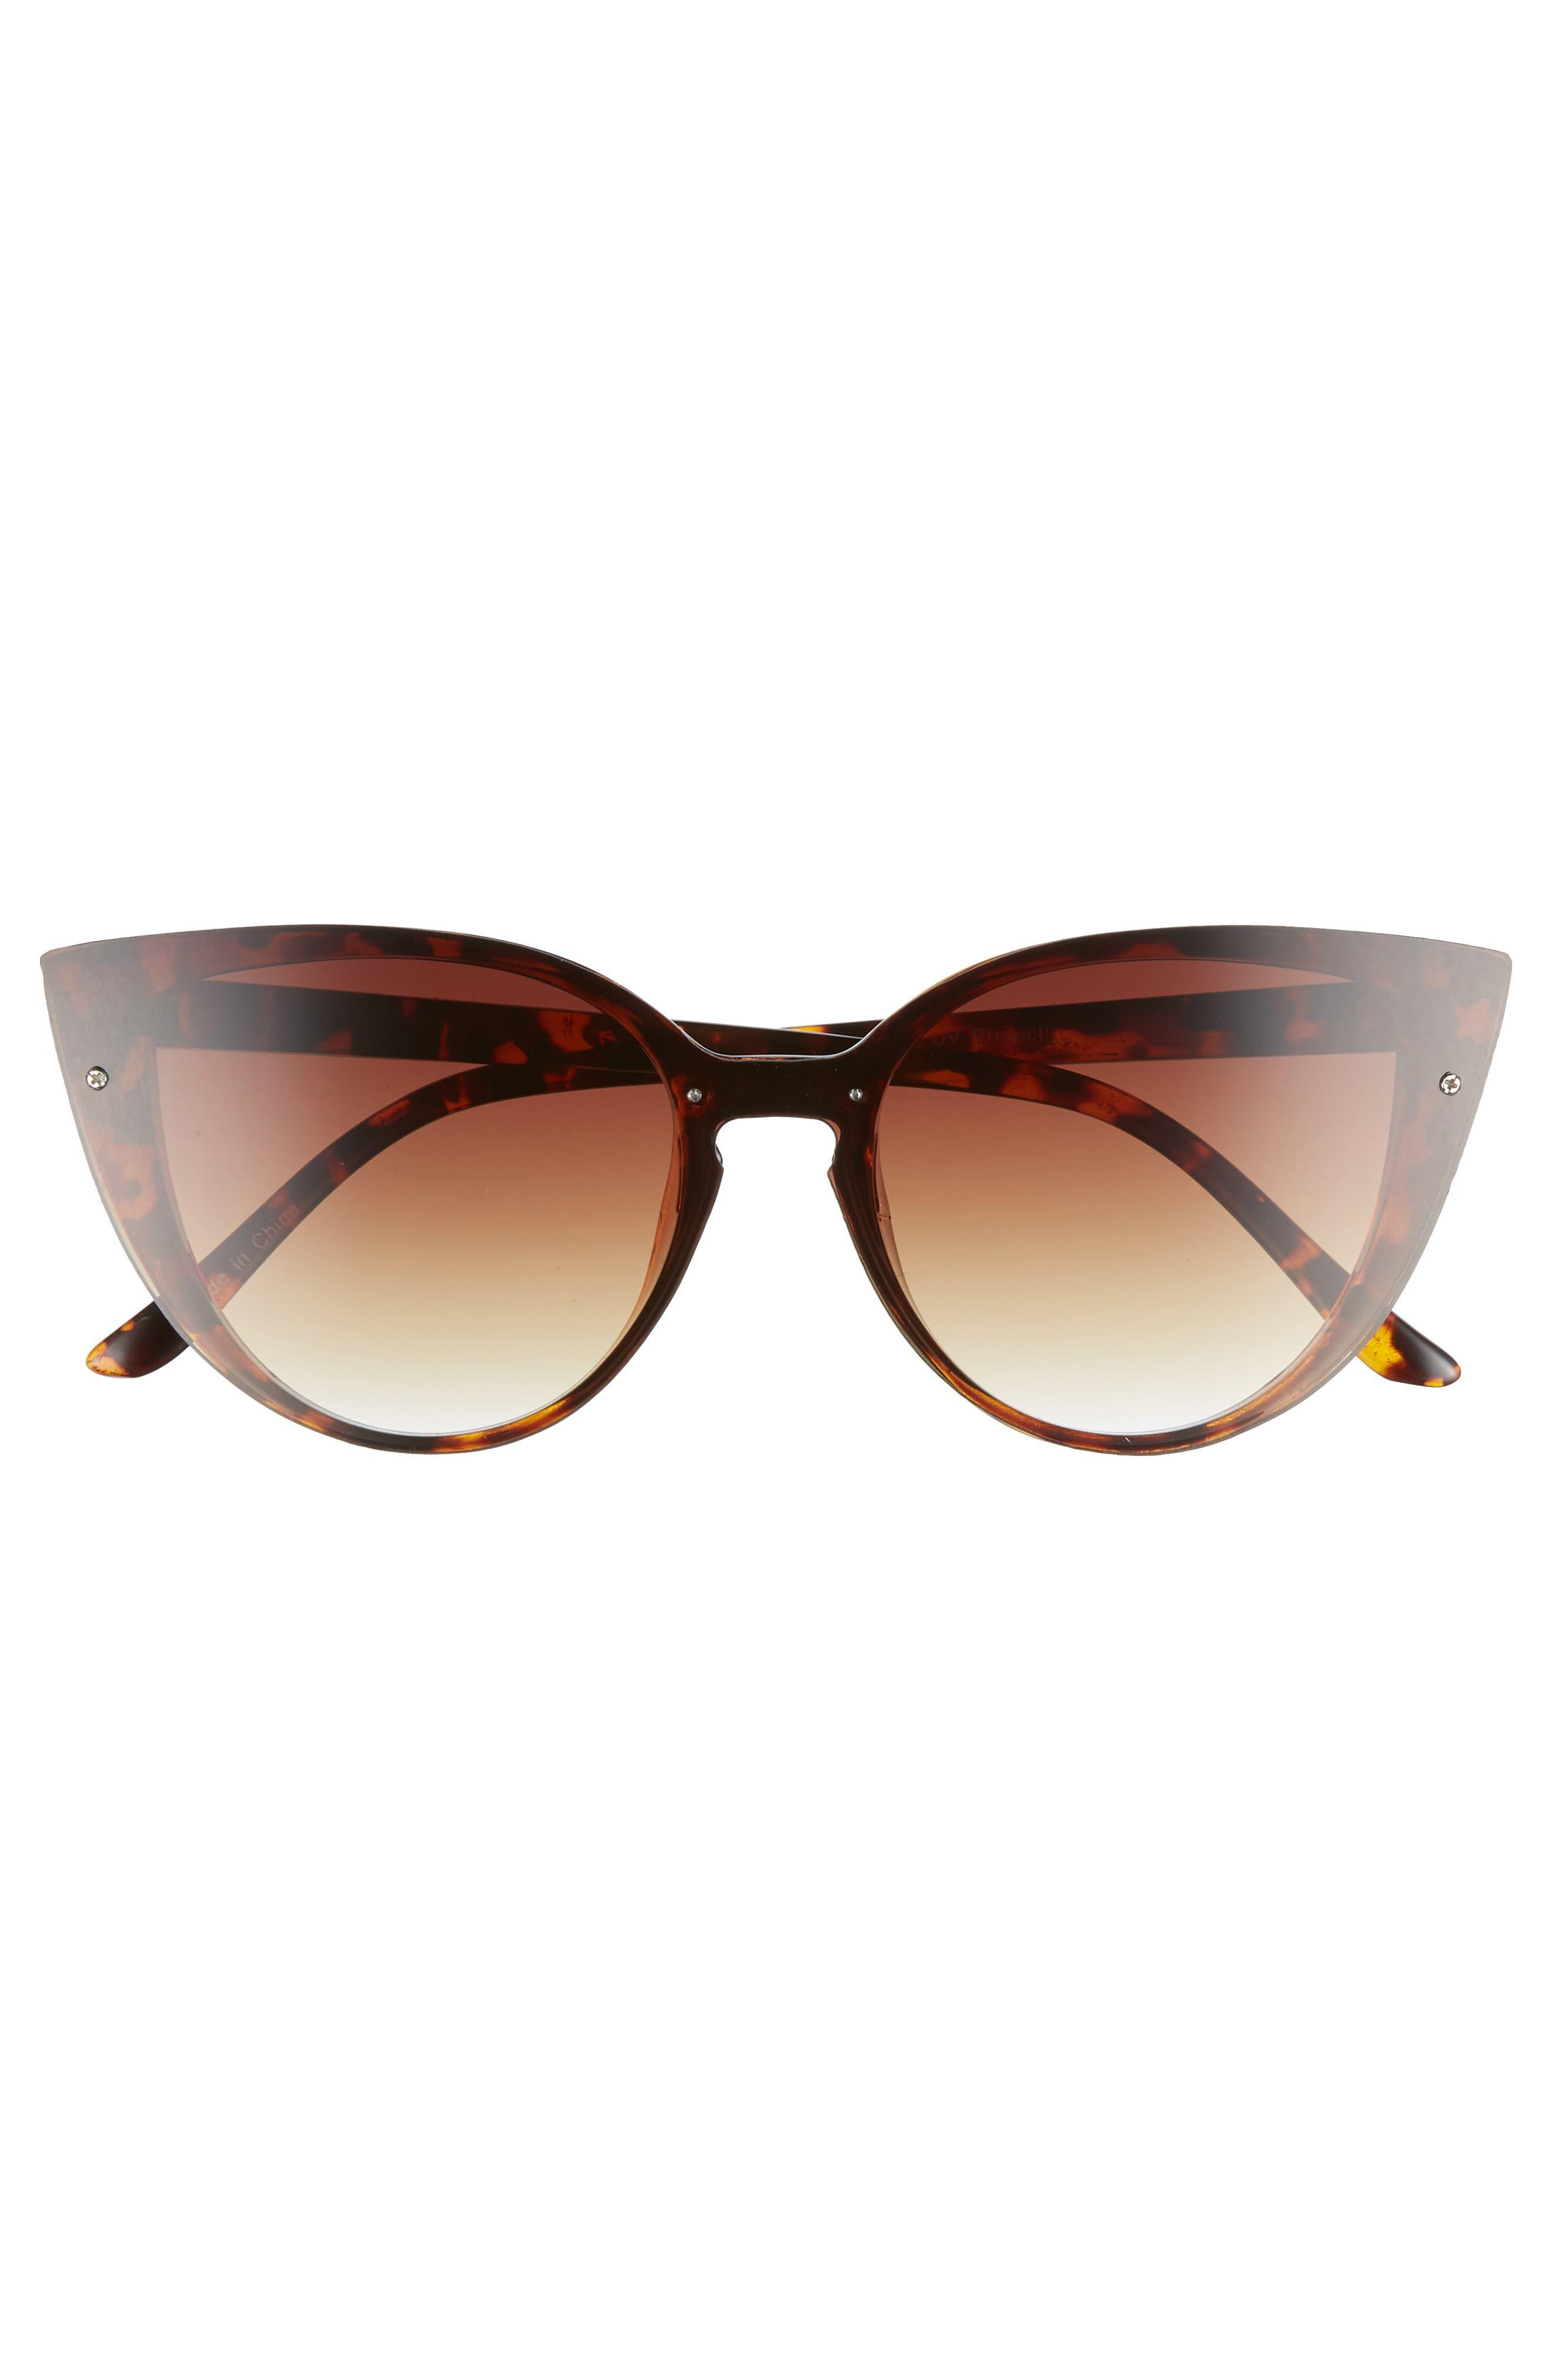 52mm Flat Cat Eye Sunglasses,                             Alternate thumbnail 3, color,                             200